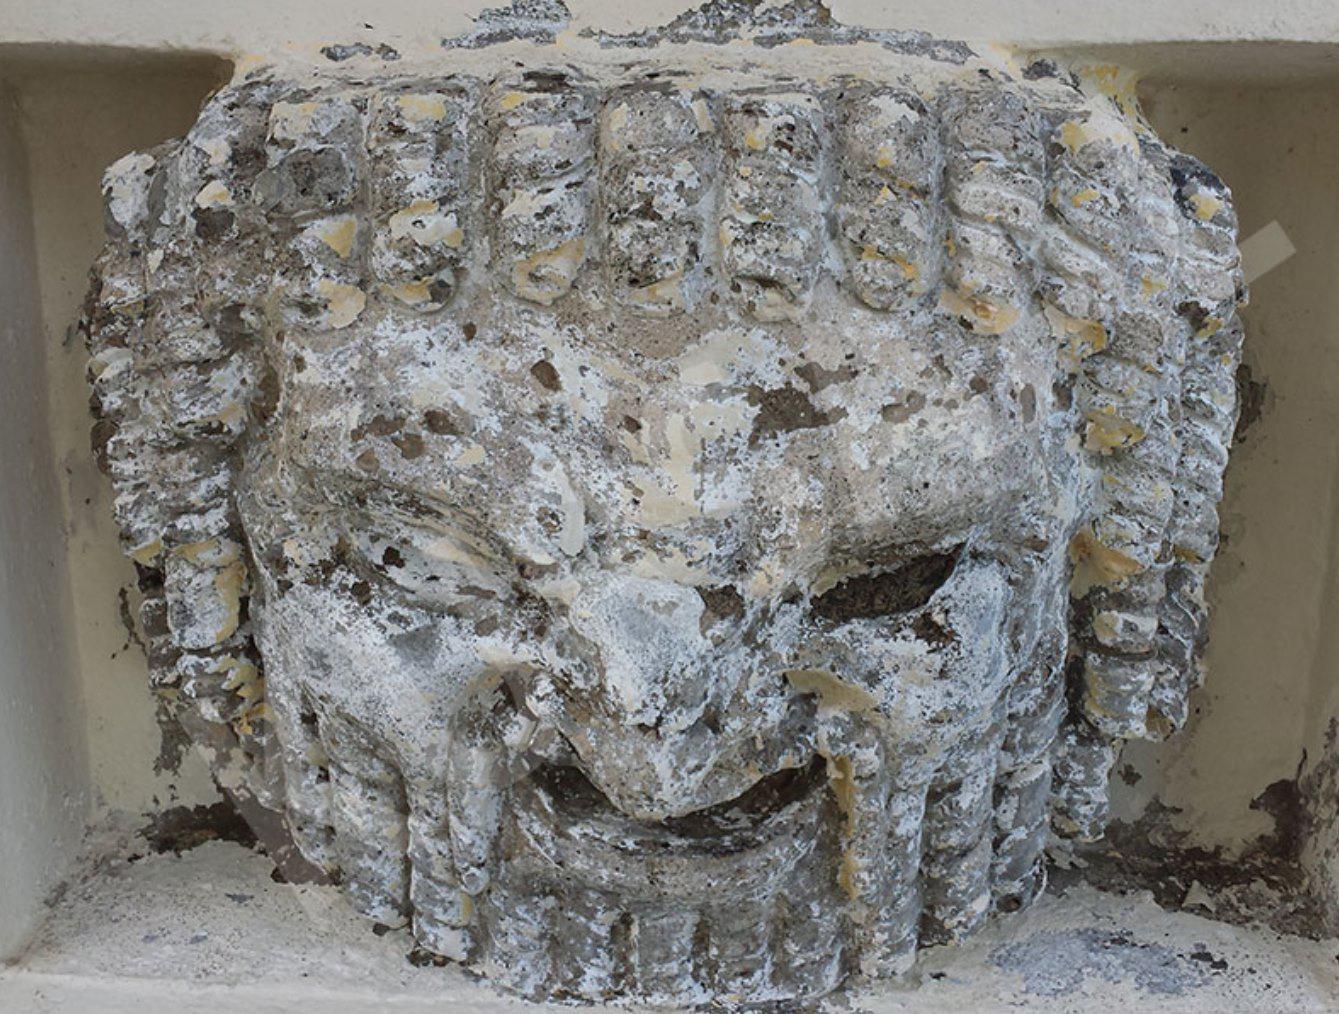 foto 11 - Restauración y patrimonio-Aldamar 7-9-DONOSTIA, GIPUZKOA